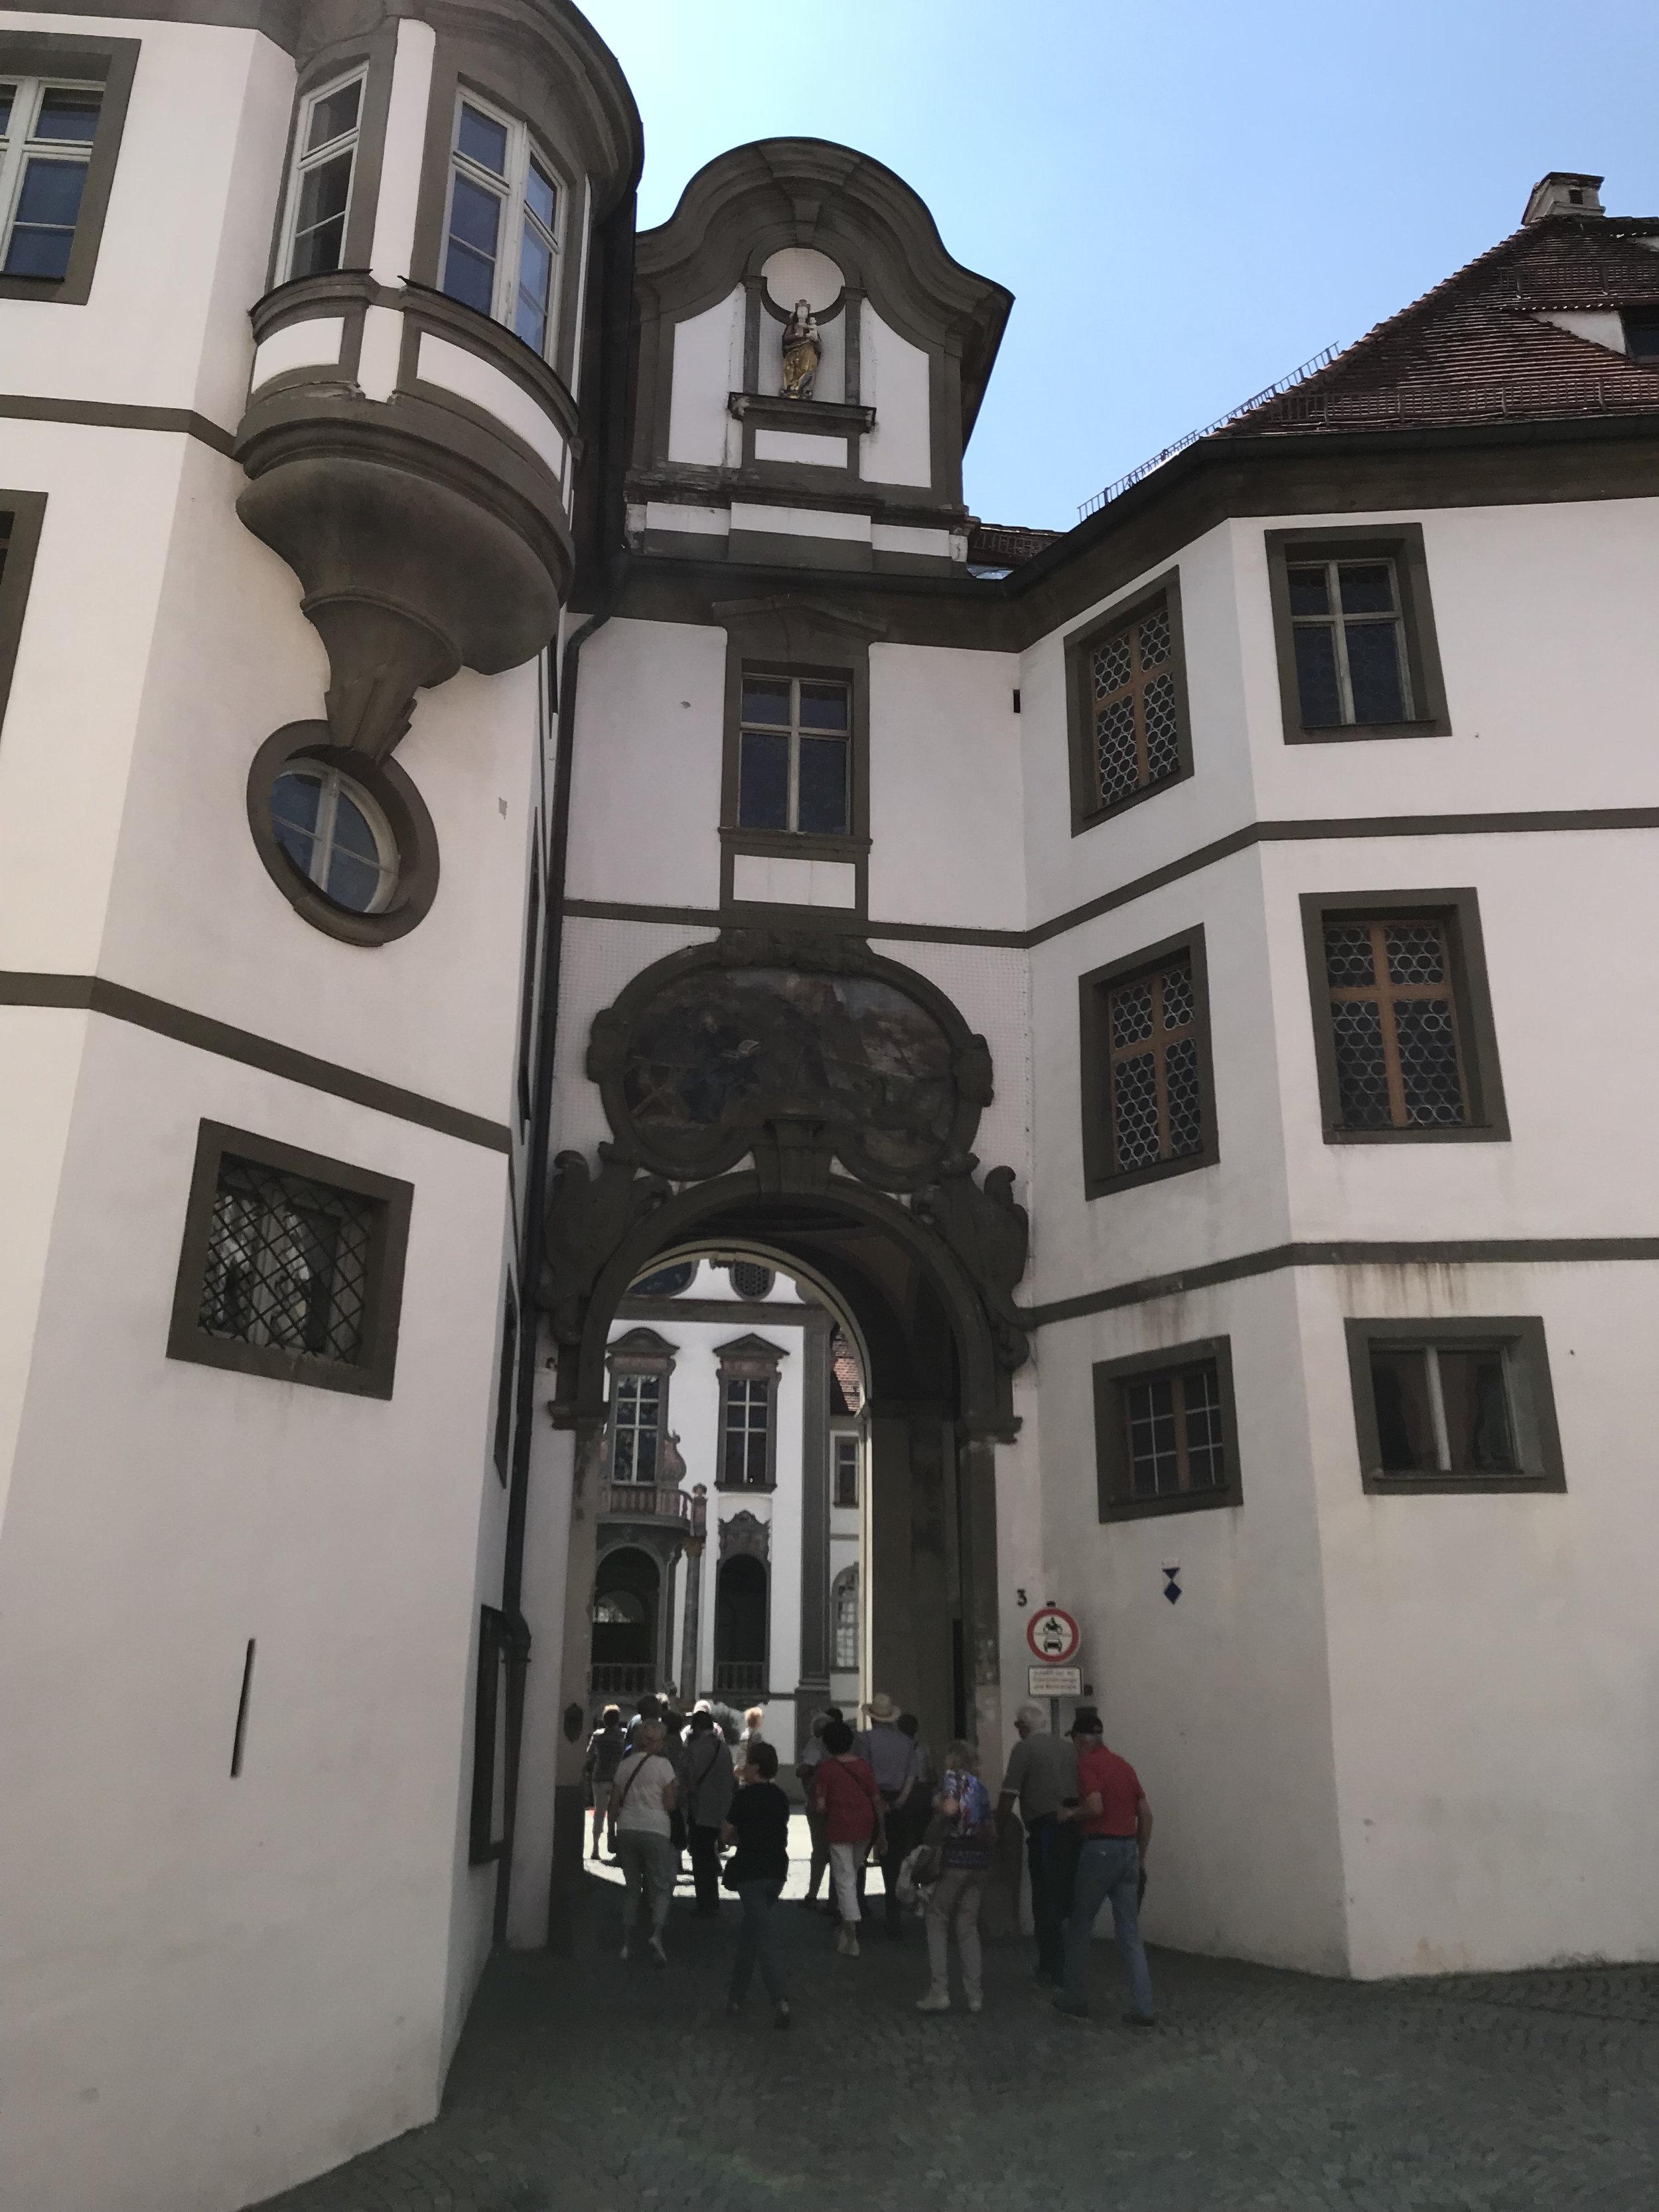 Teri_Day2_Castles_Germany&Austria_spiritedtable_photo28.jpg